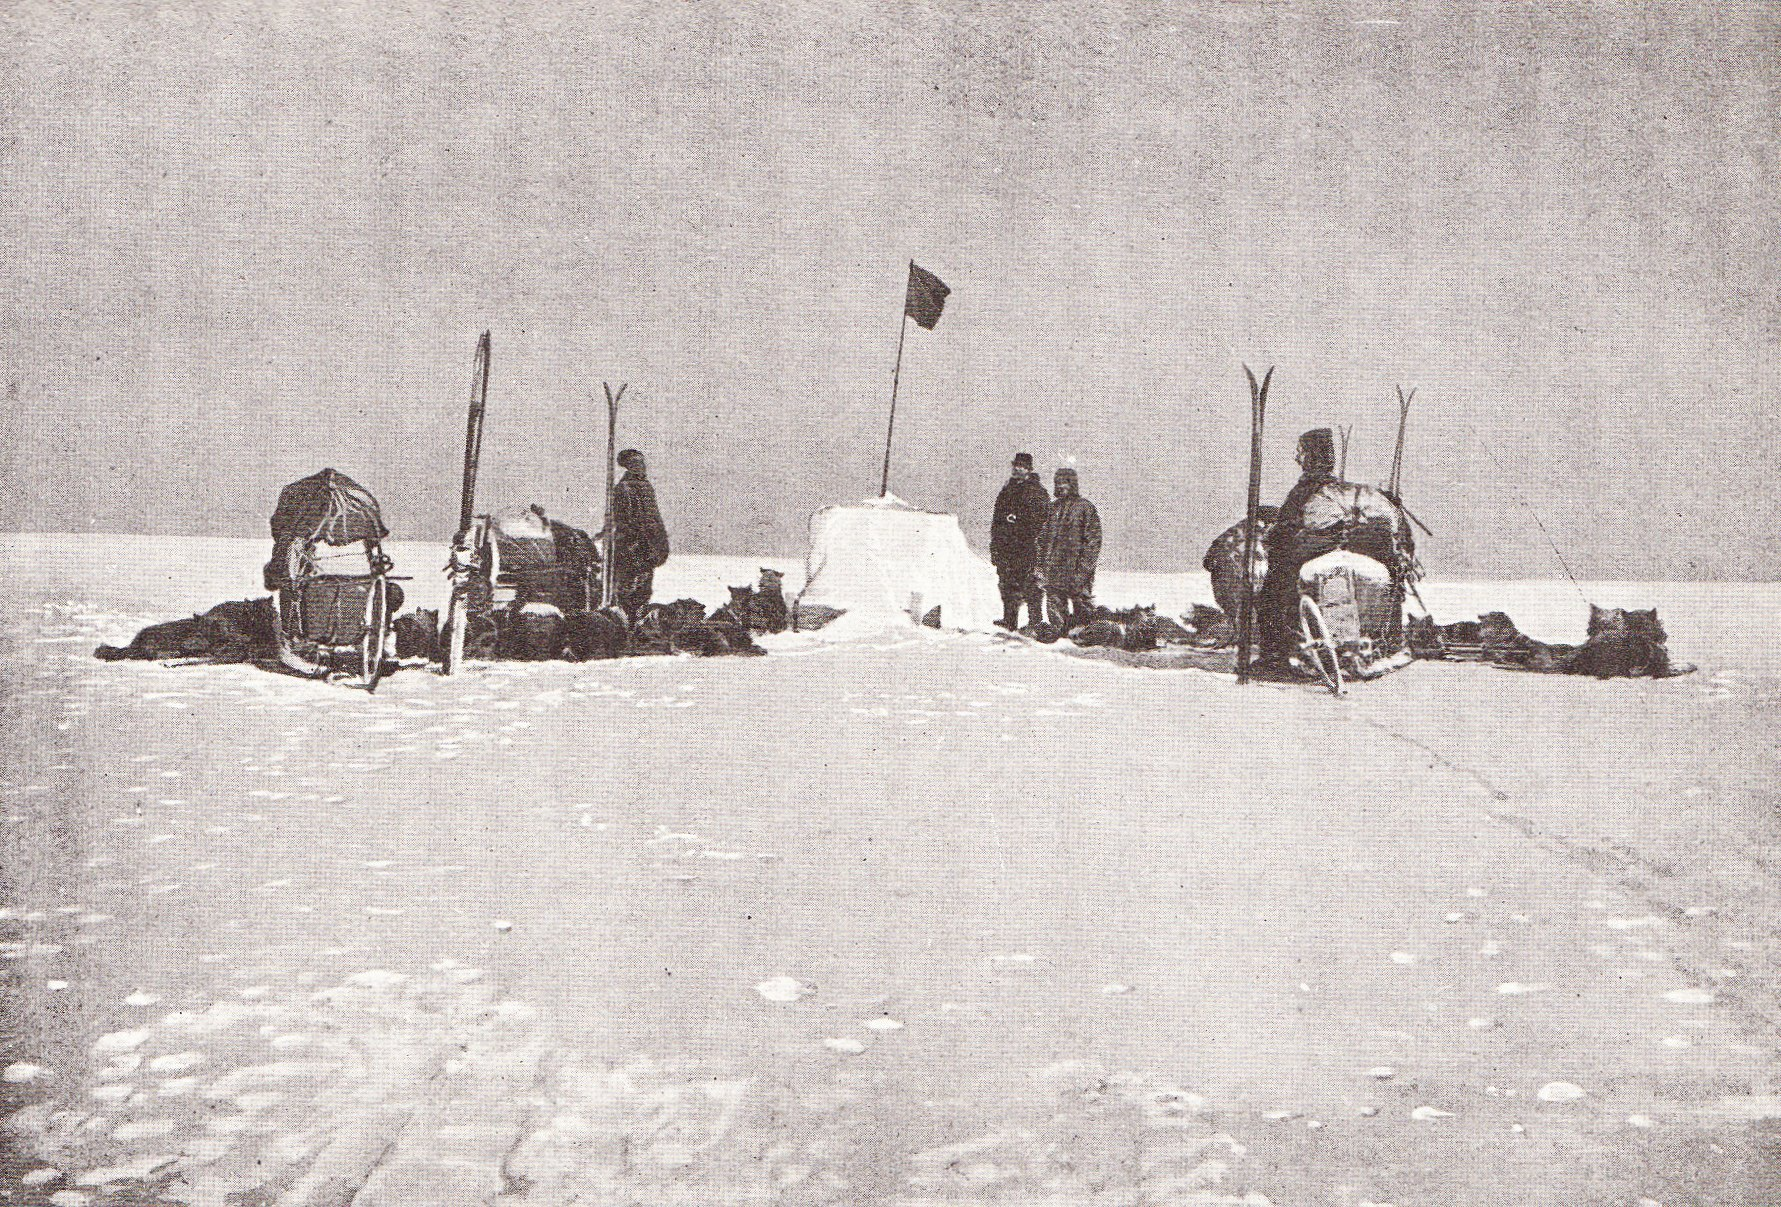 Roald Amundsen's South Pole party, en route to the pole November 1911